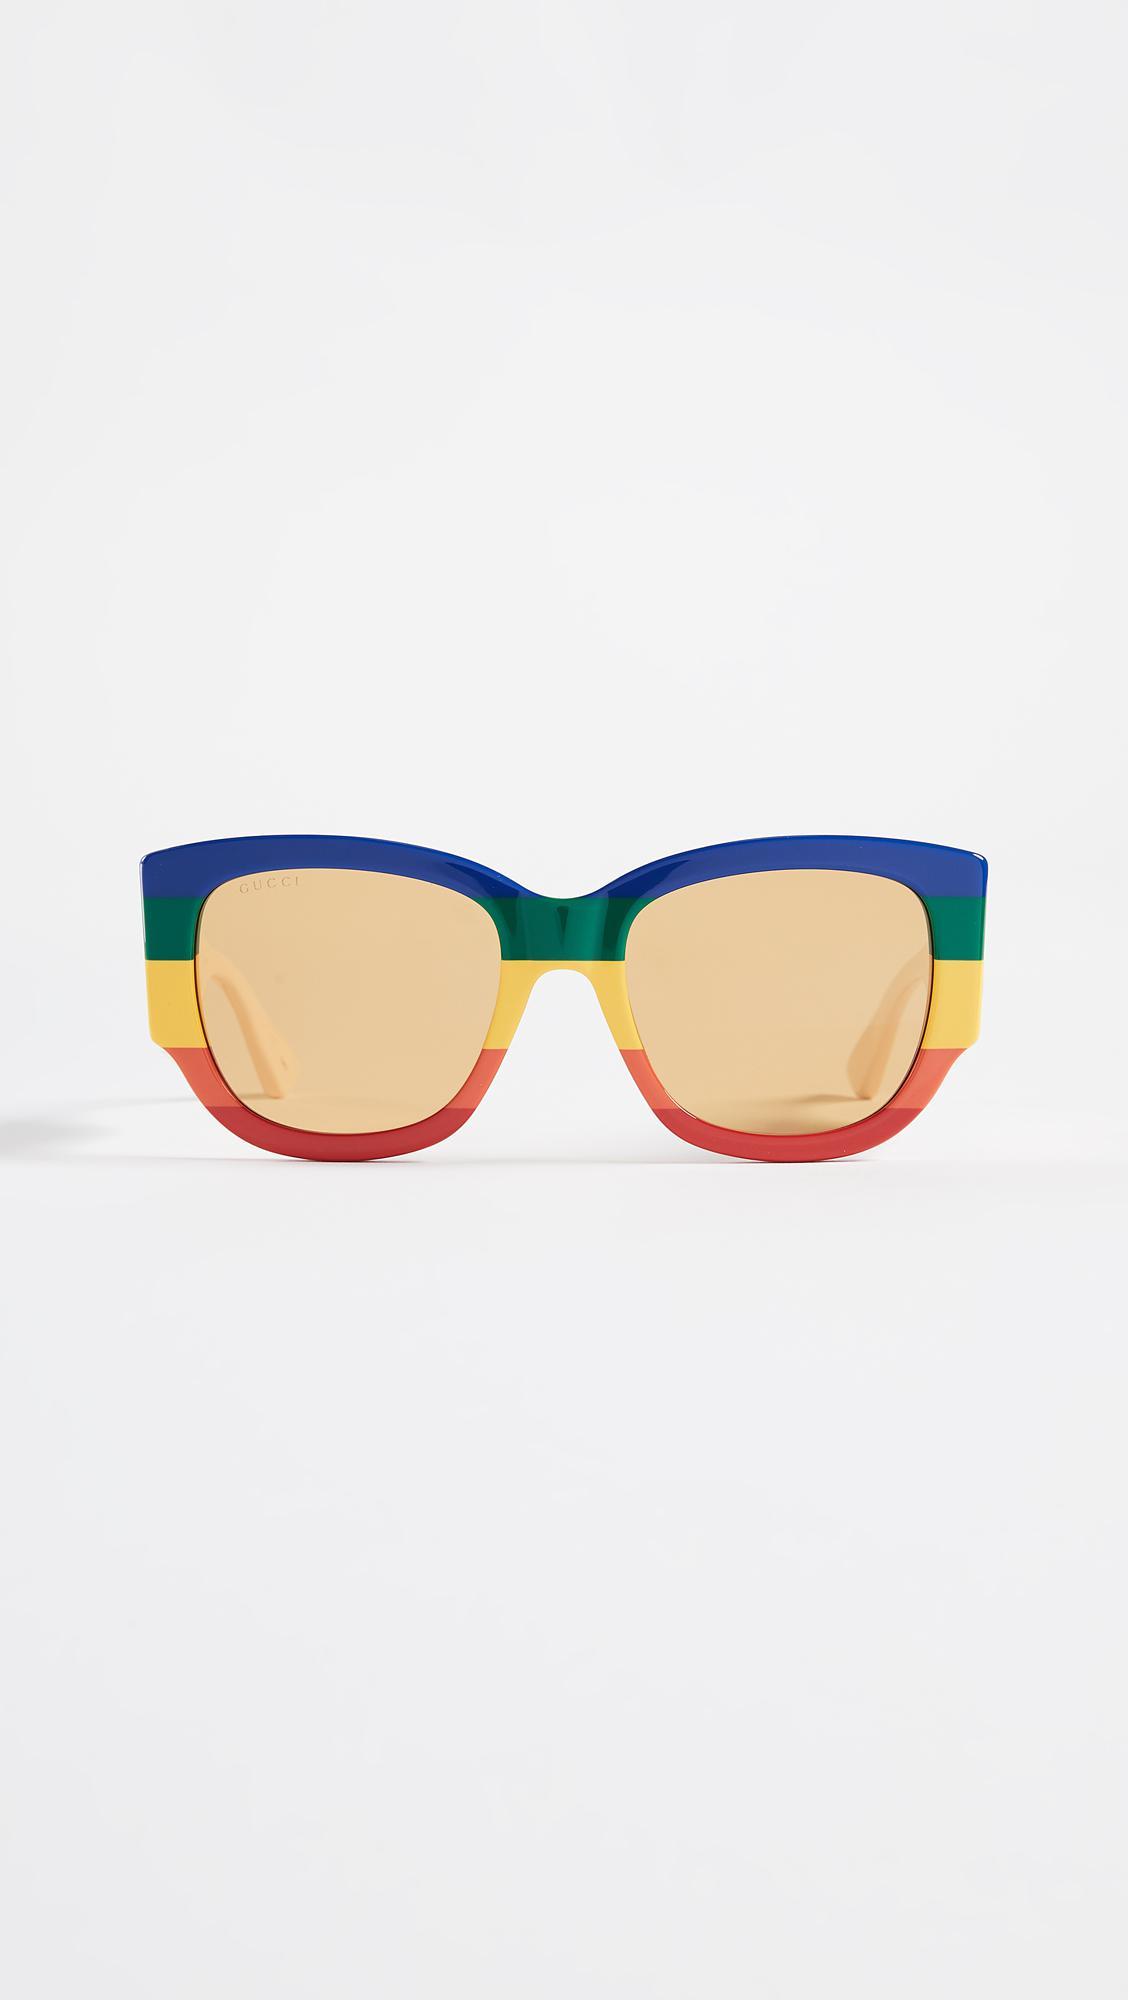 b87369d526f Lyst - Gucci Sylvie Bold Cat Eye Sunglasses